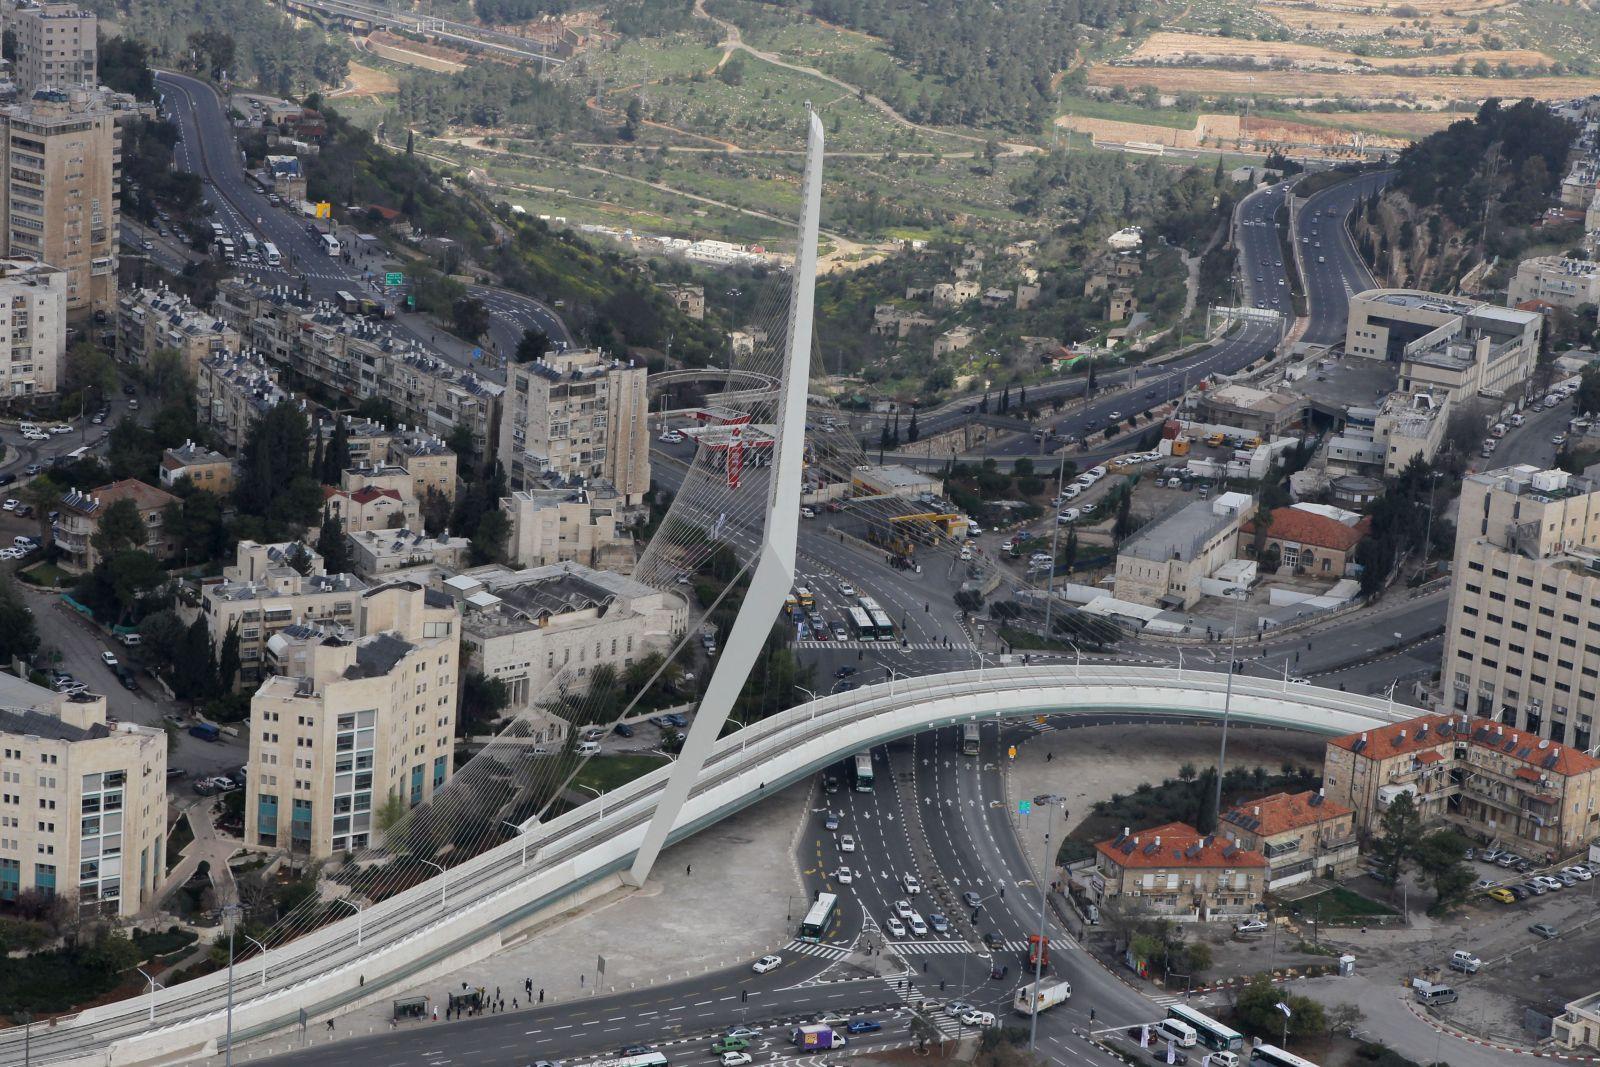 The Chords Bridge dominates the Jerusalem skyline. Photo by Nati Shohat/FLASH90